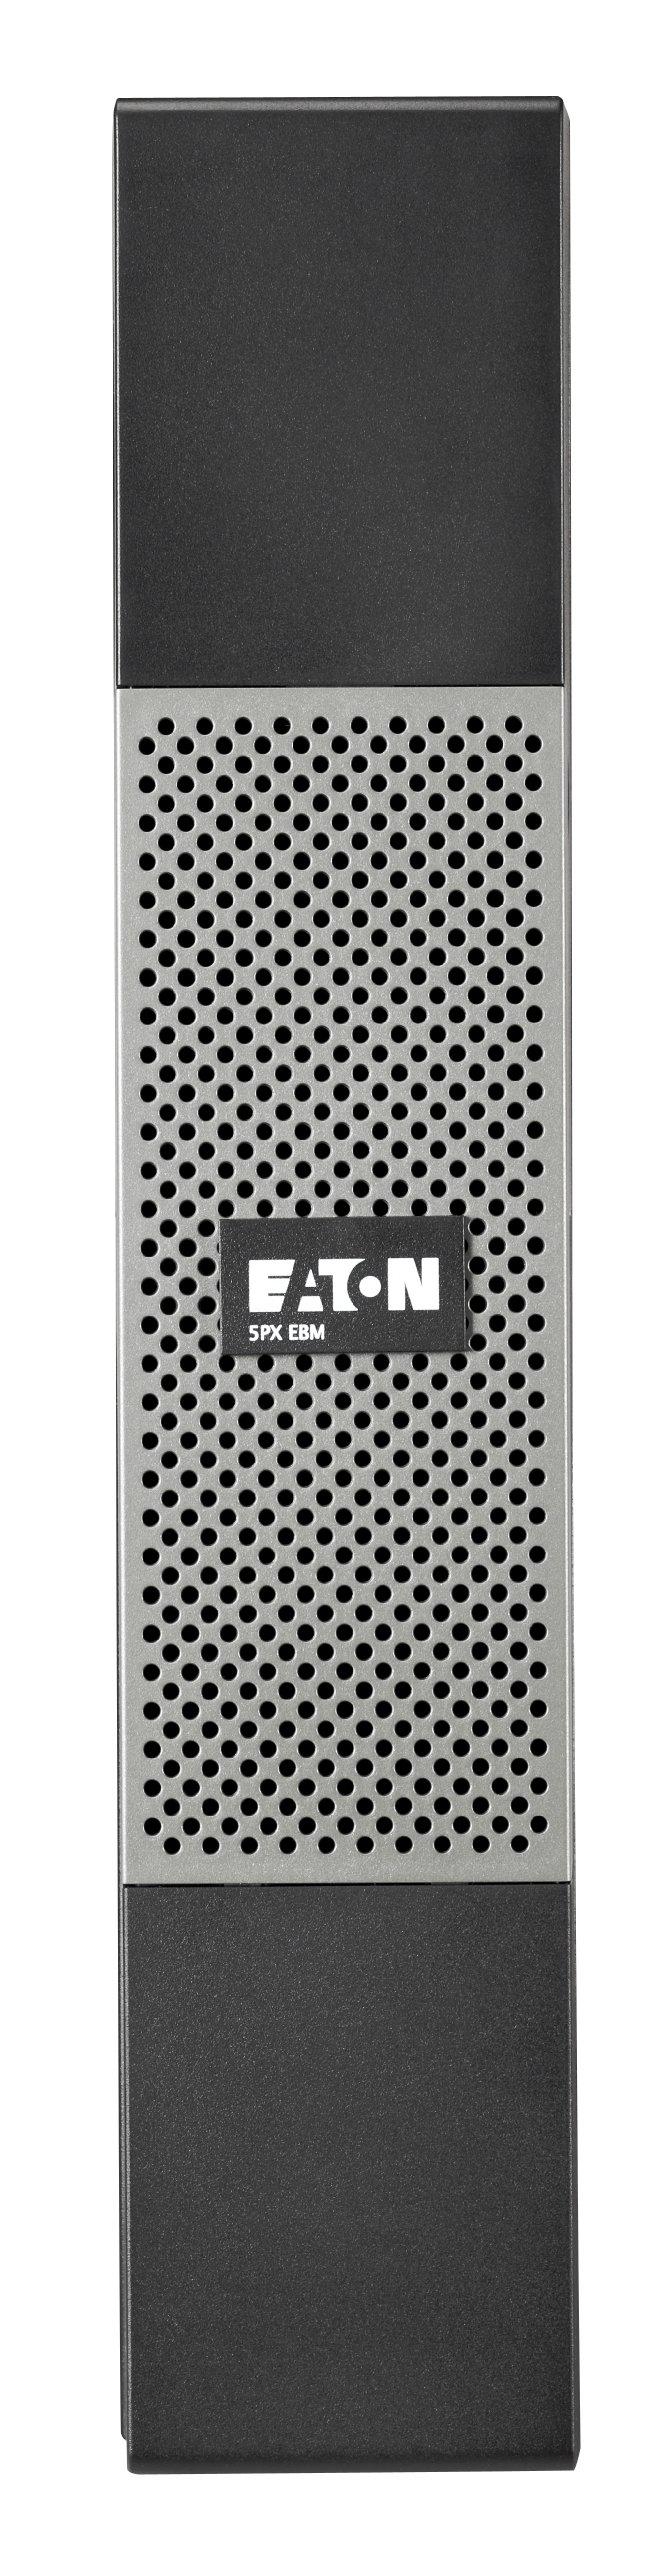 Eaton Ups External Battery Module